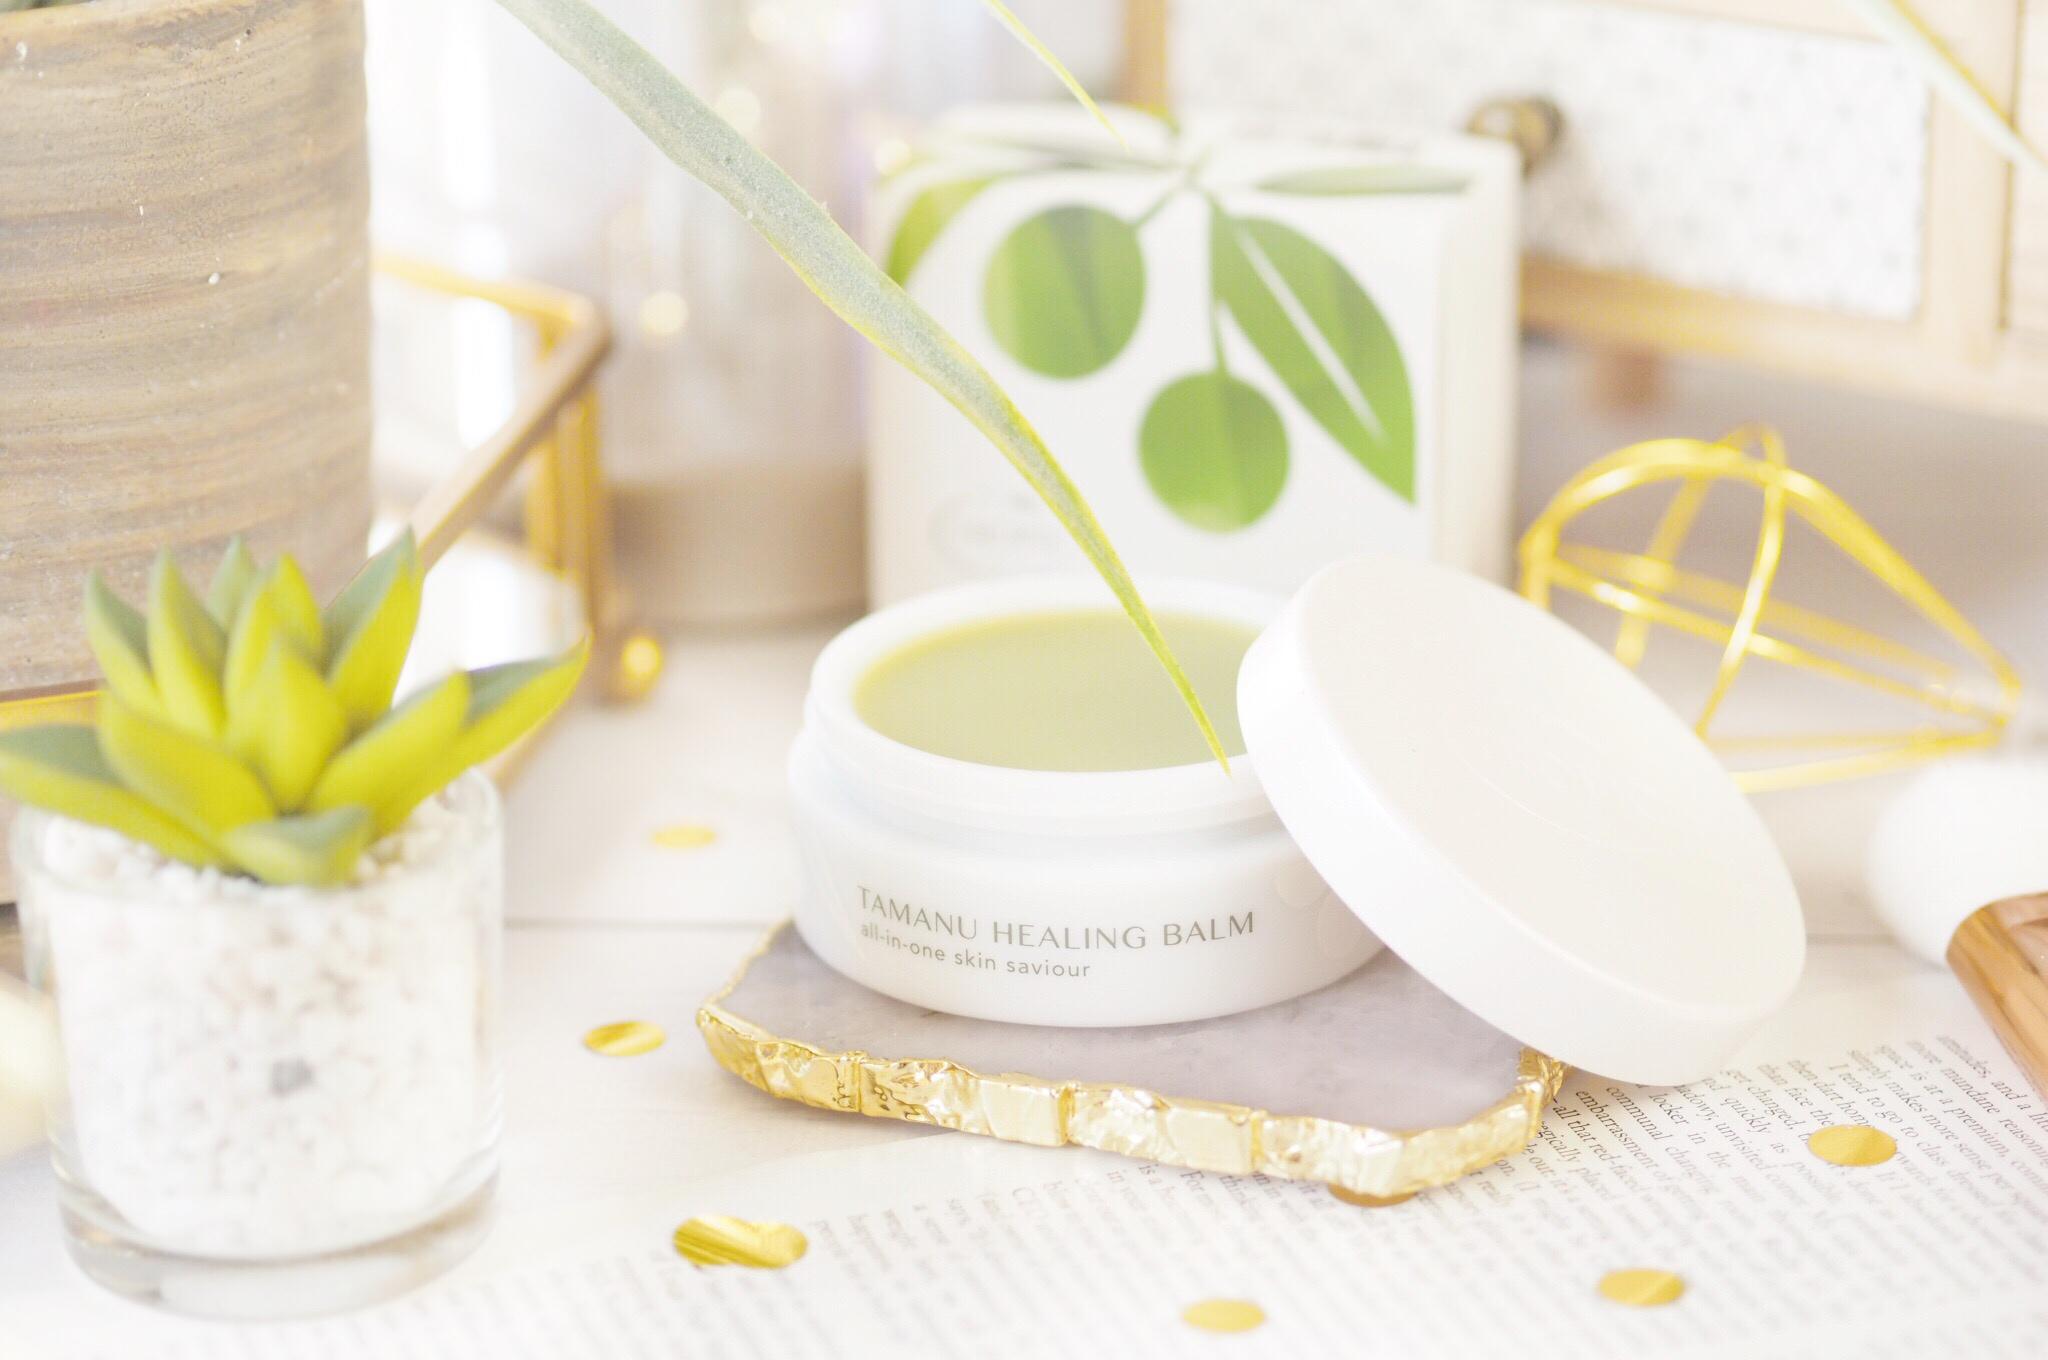 Tropic Skincare Tamanu Healing Balm Review